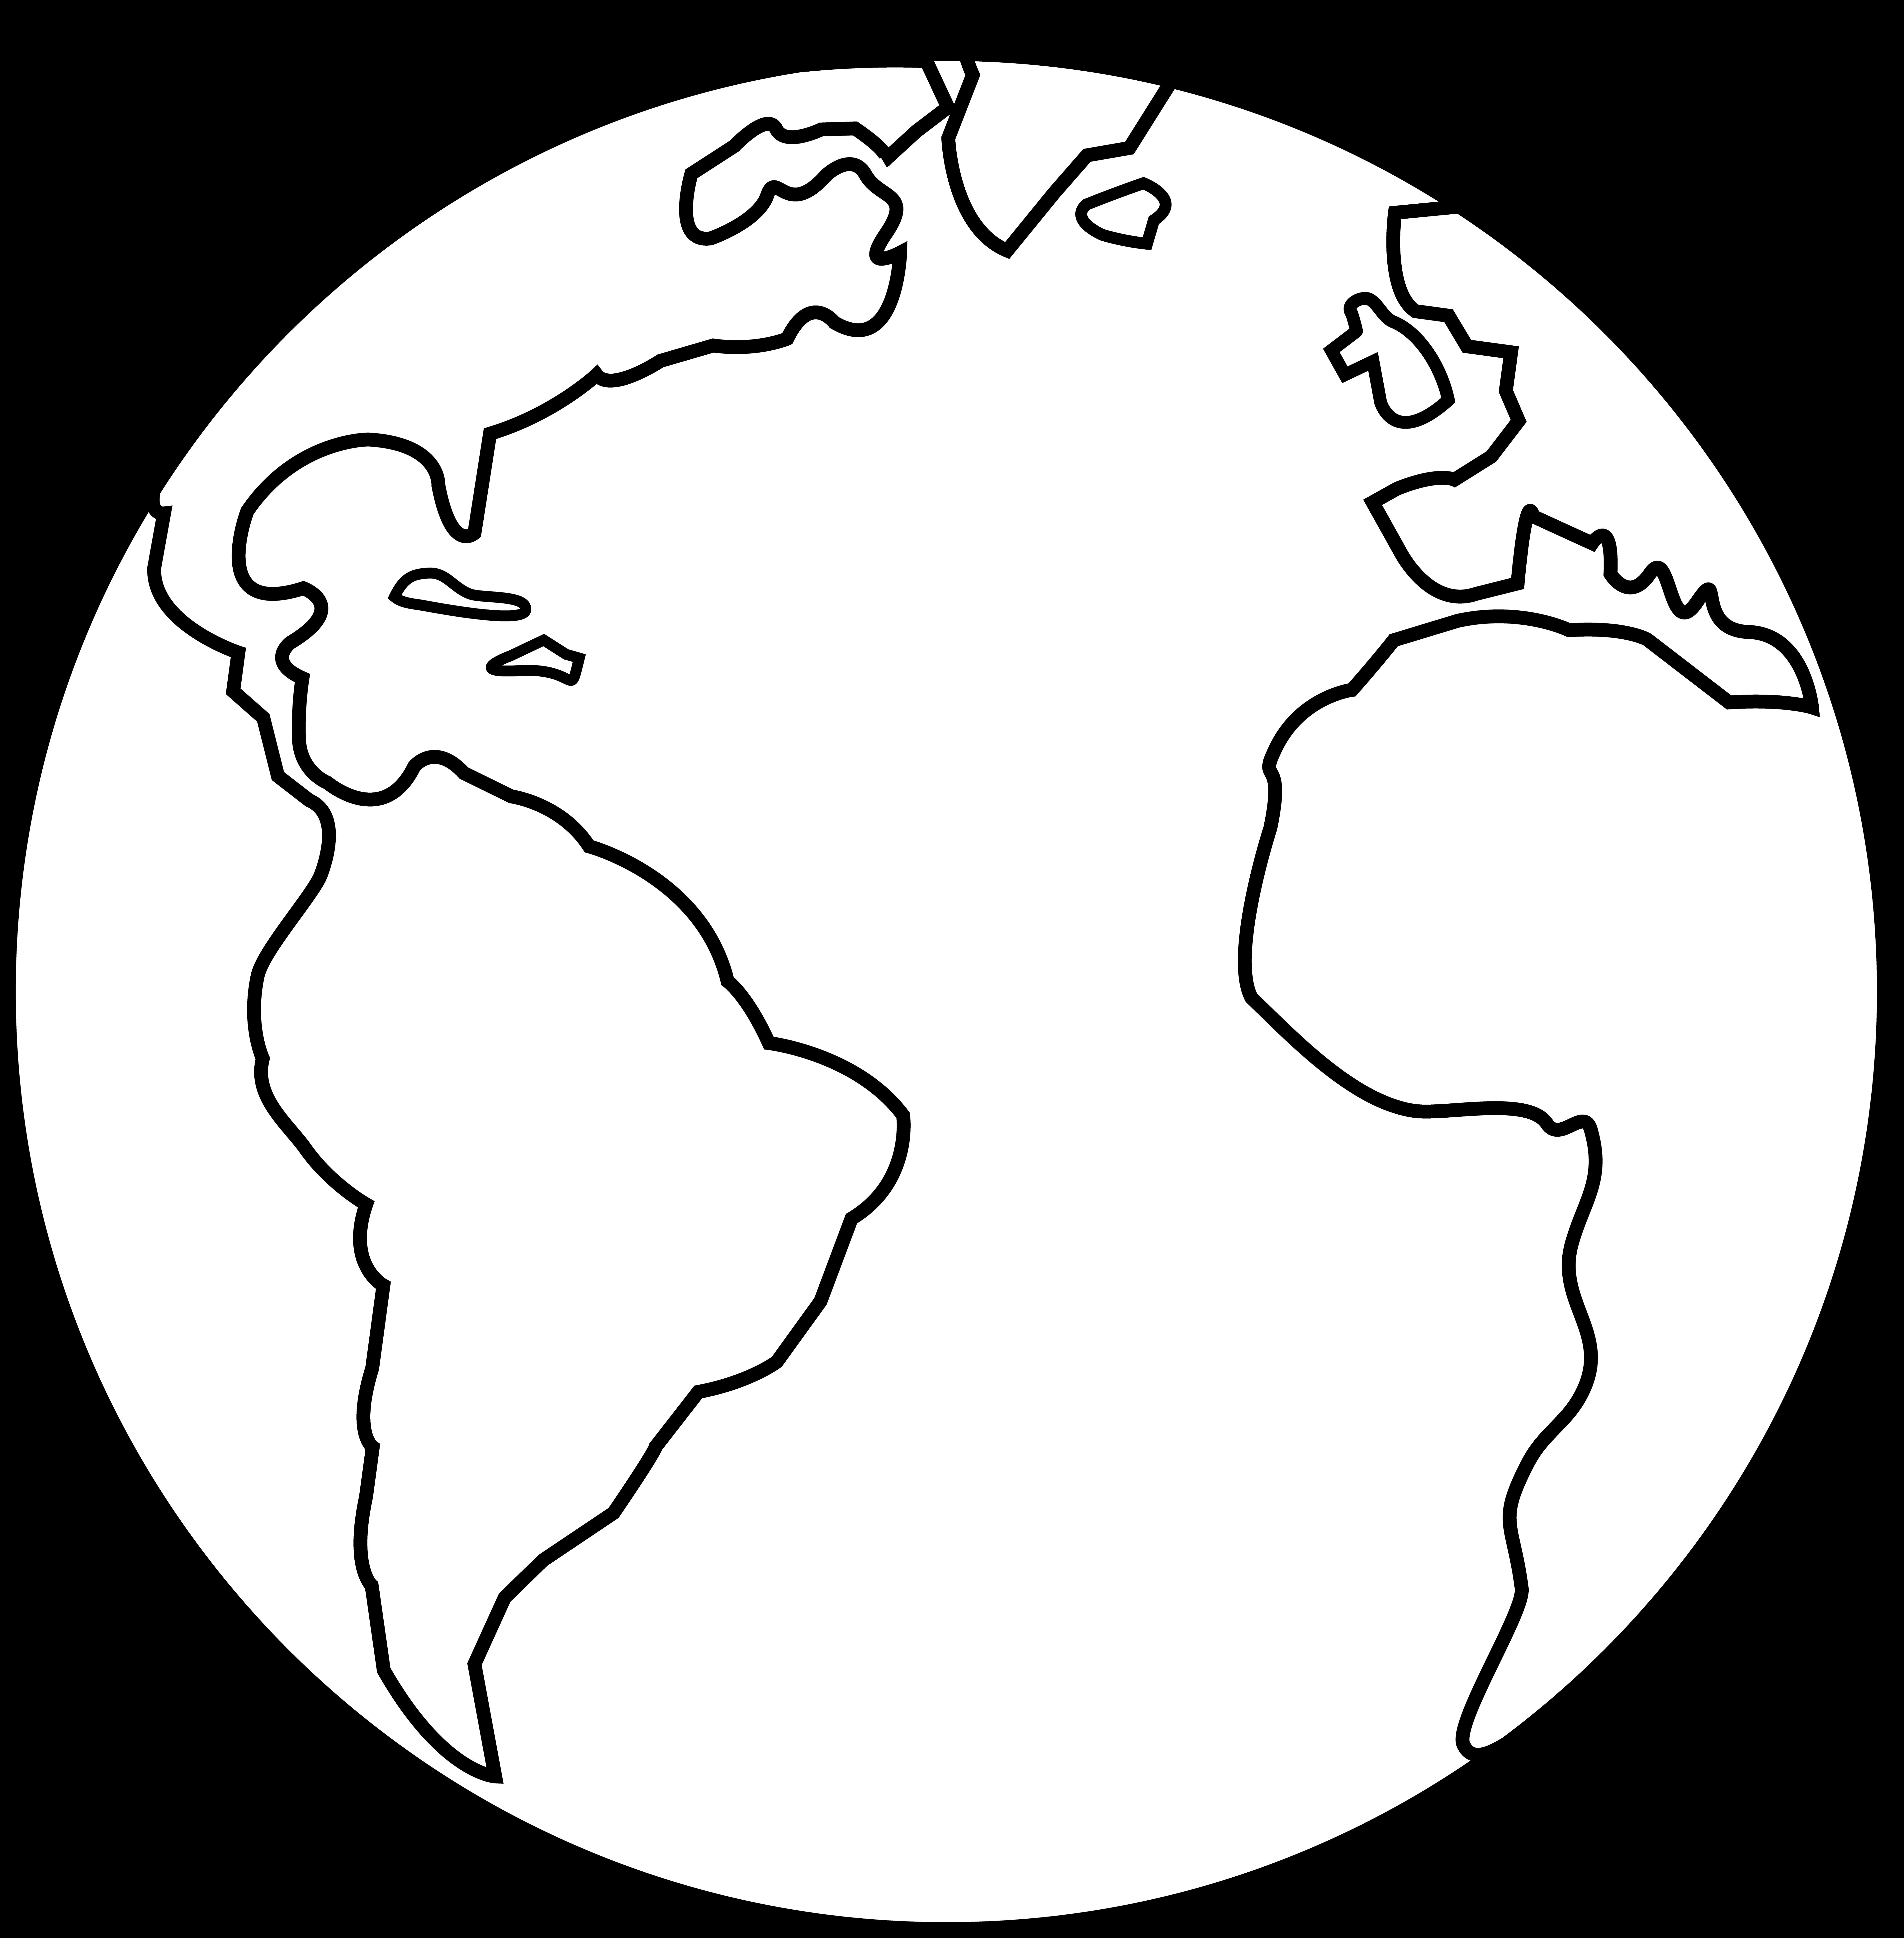 7629x7765 Earth Clip Art Many Interesting Cliparts